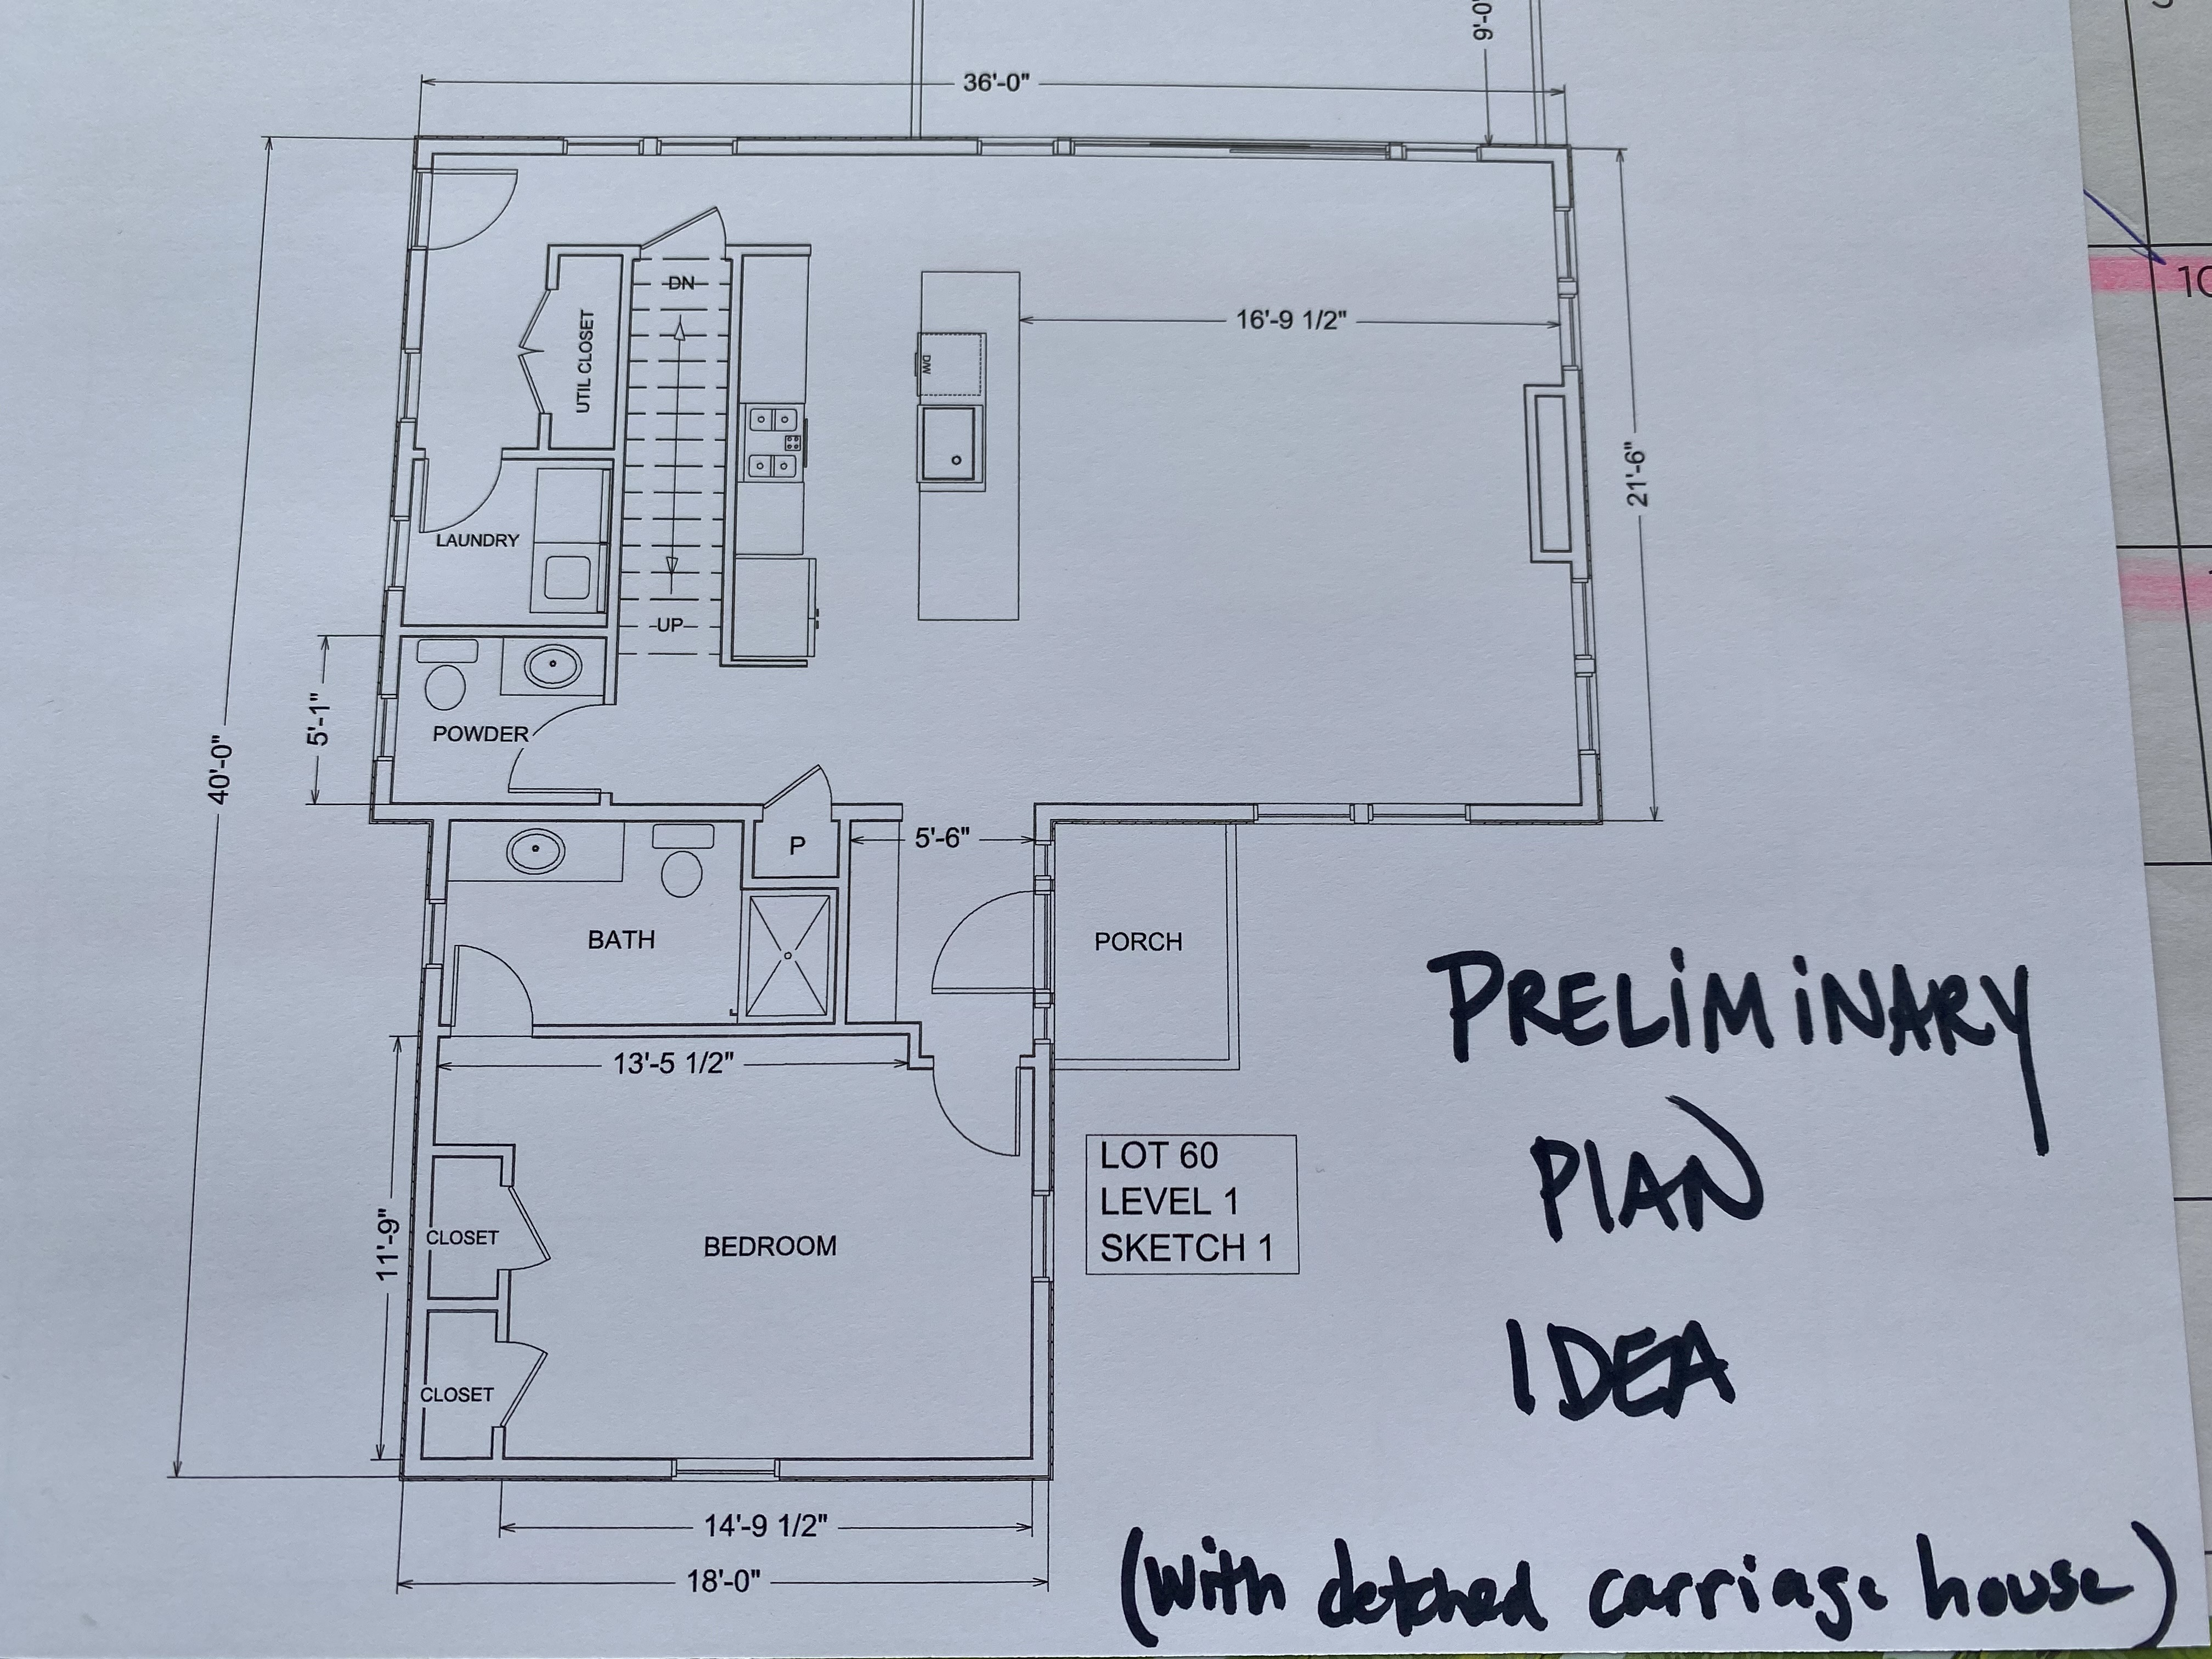 Lot 60 Plan idea Level 1